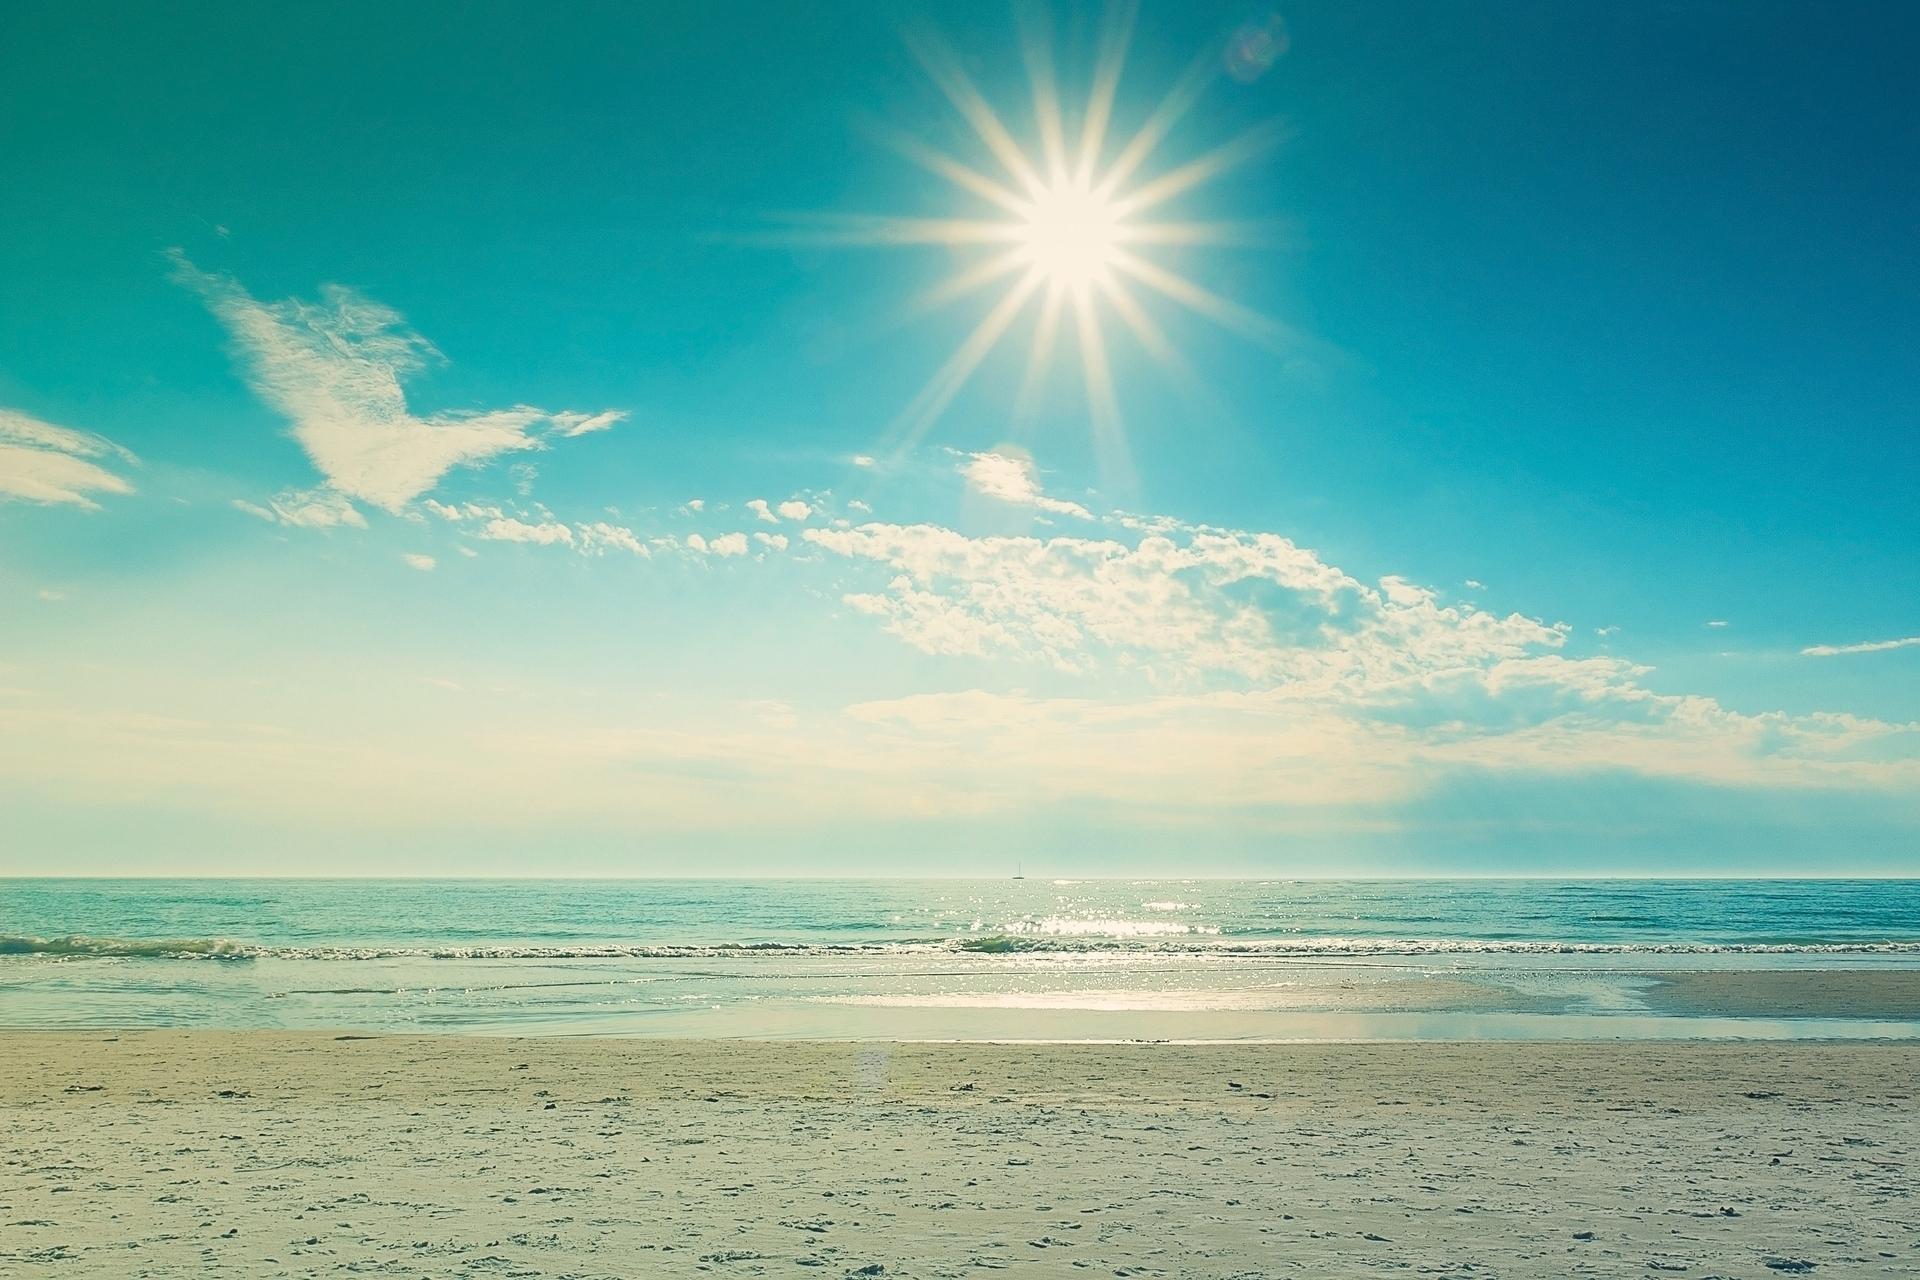 Summer Backgrounds, Compatible - PC, Mobile, Gadgets| 1920x1280 px